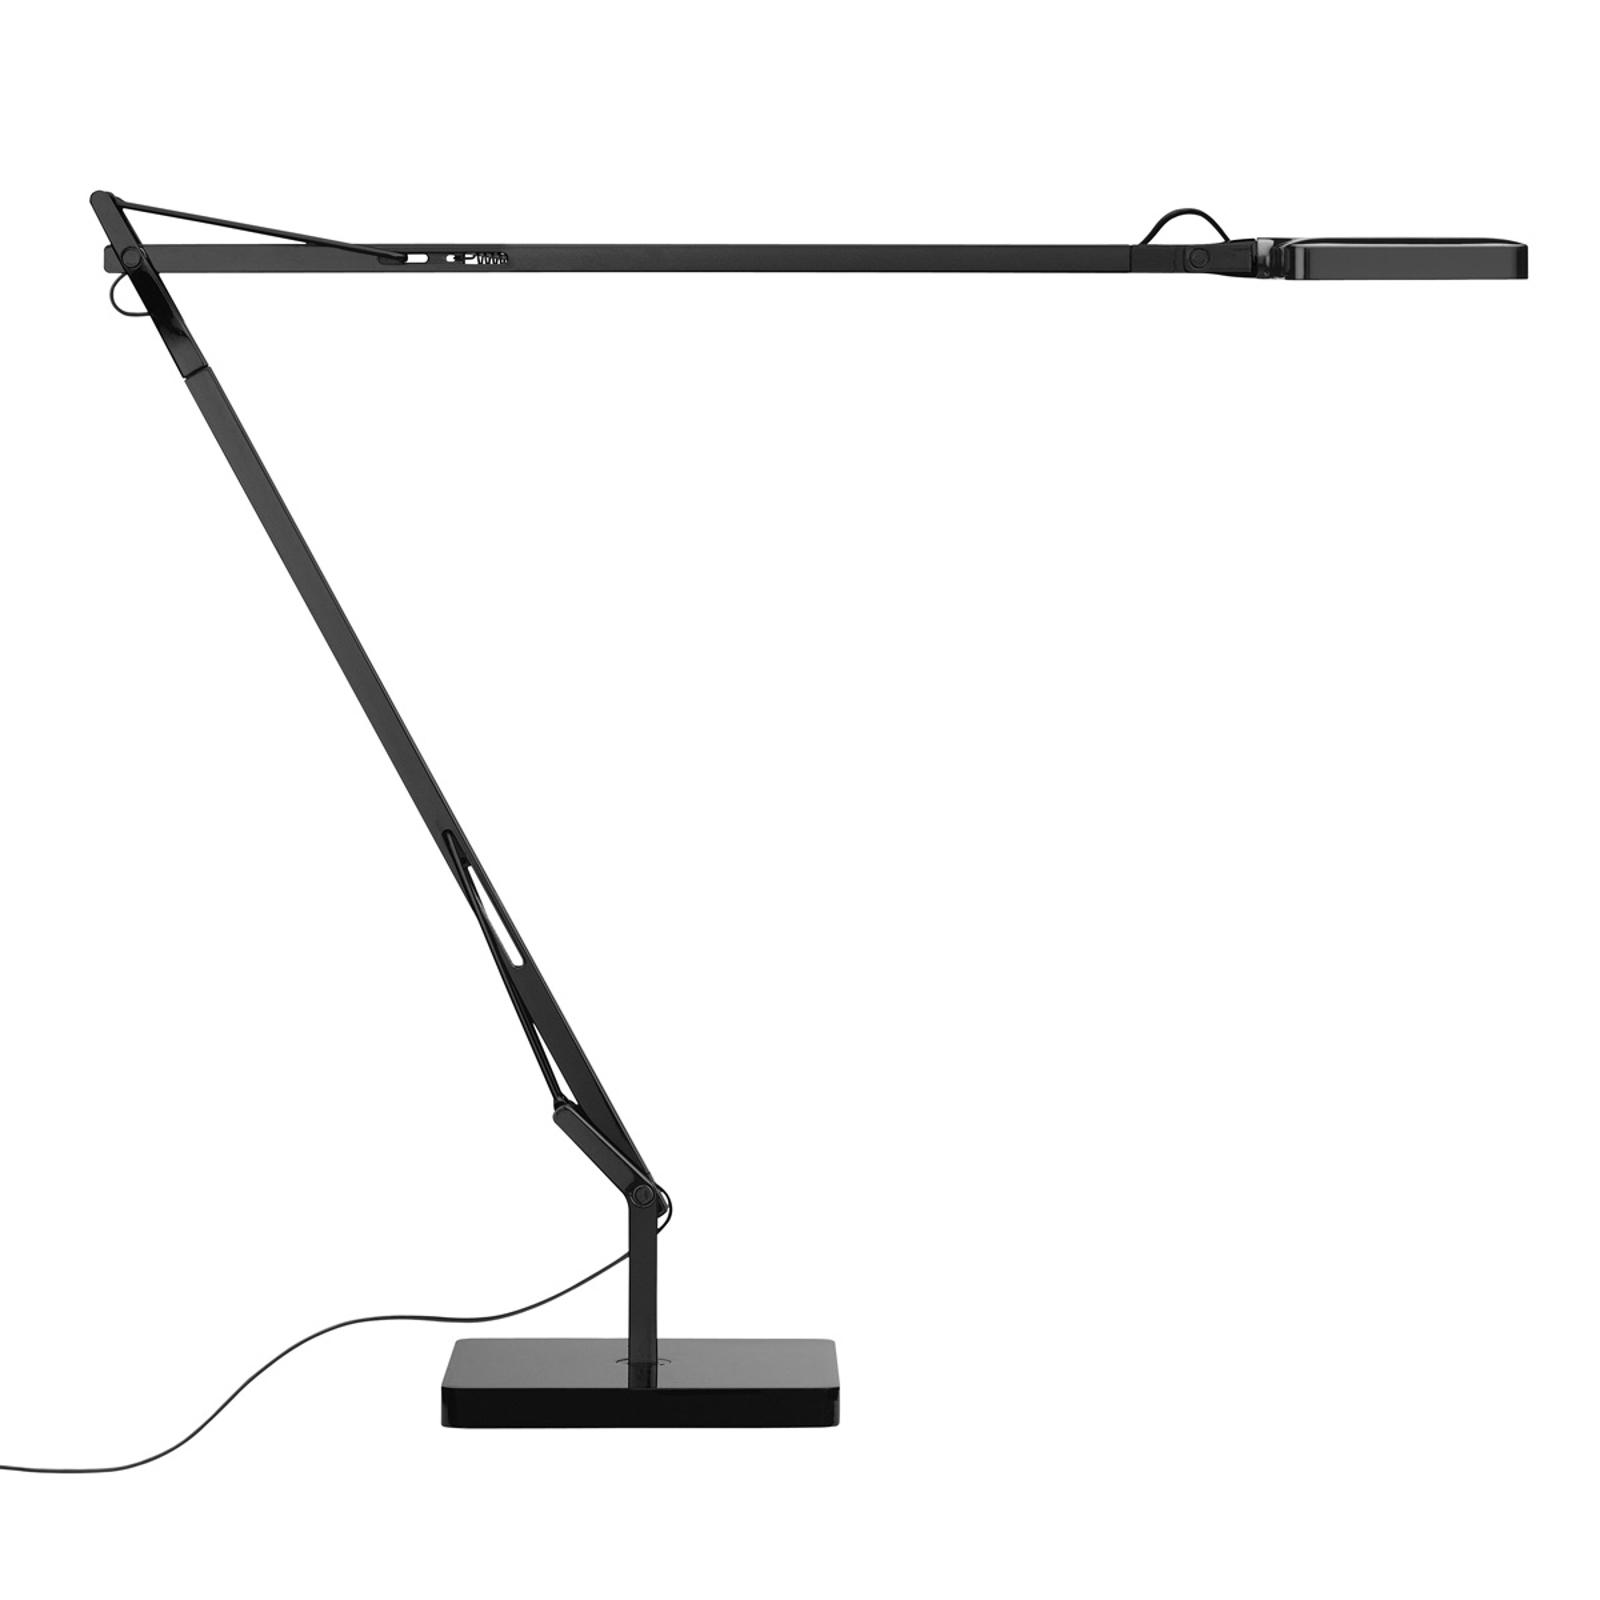 Lampe à poser LED KELVIN noire